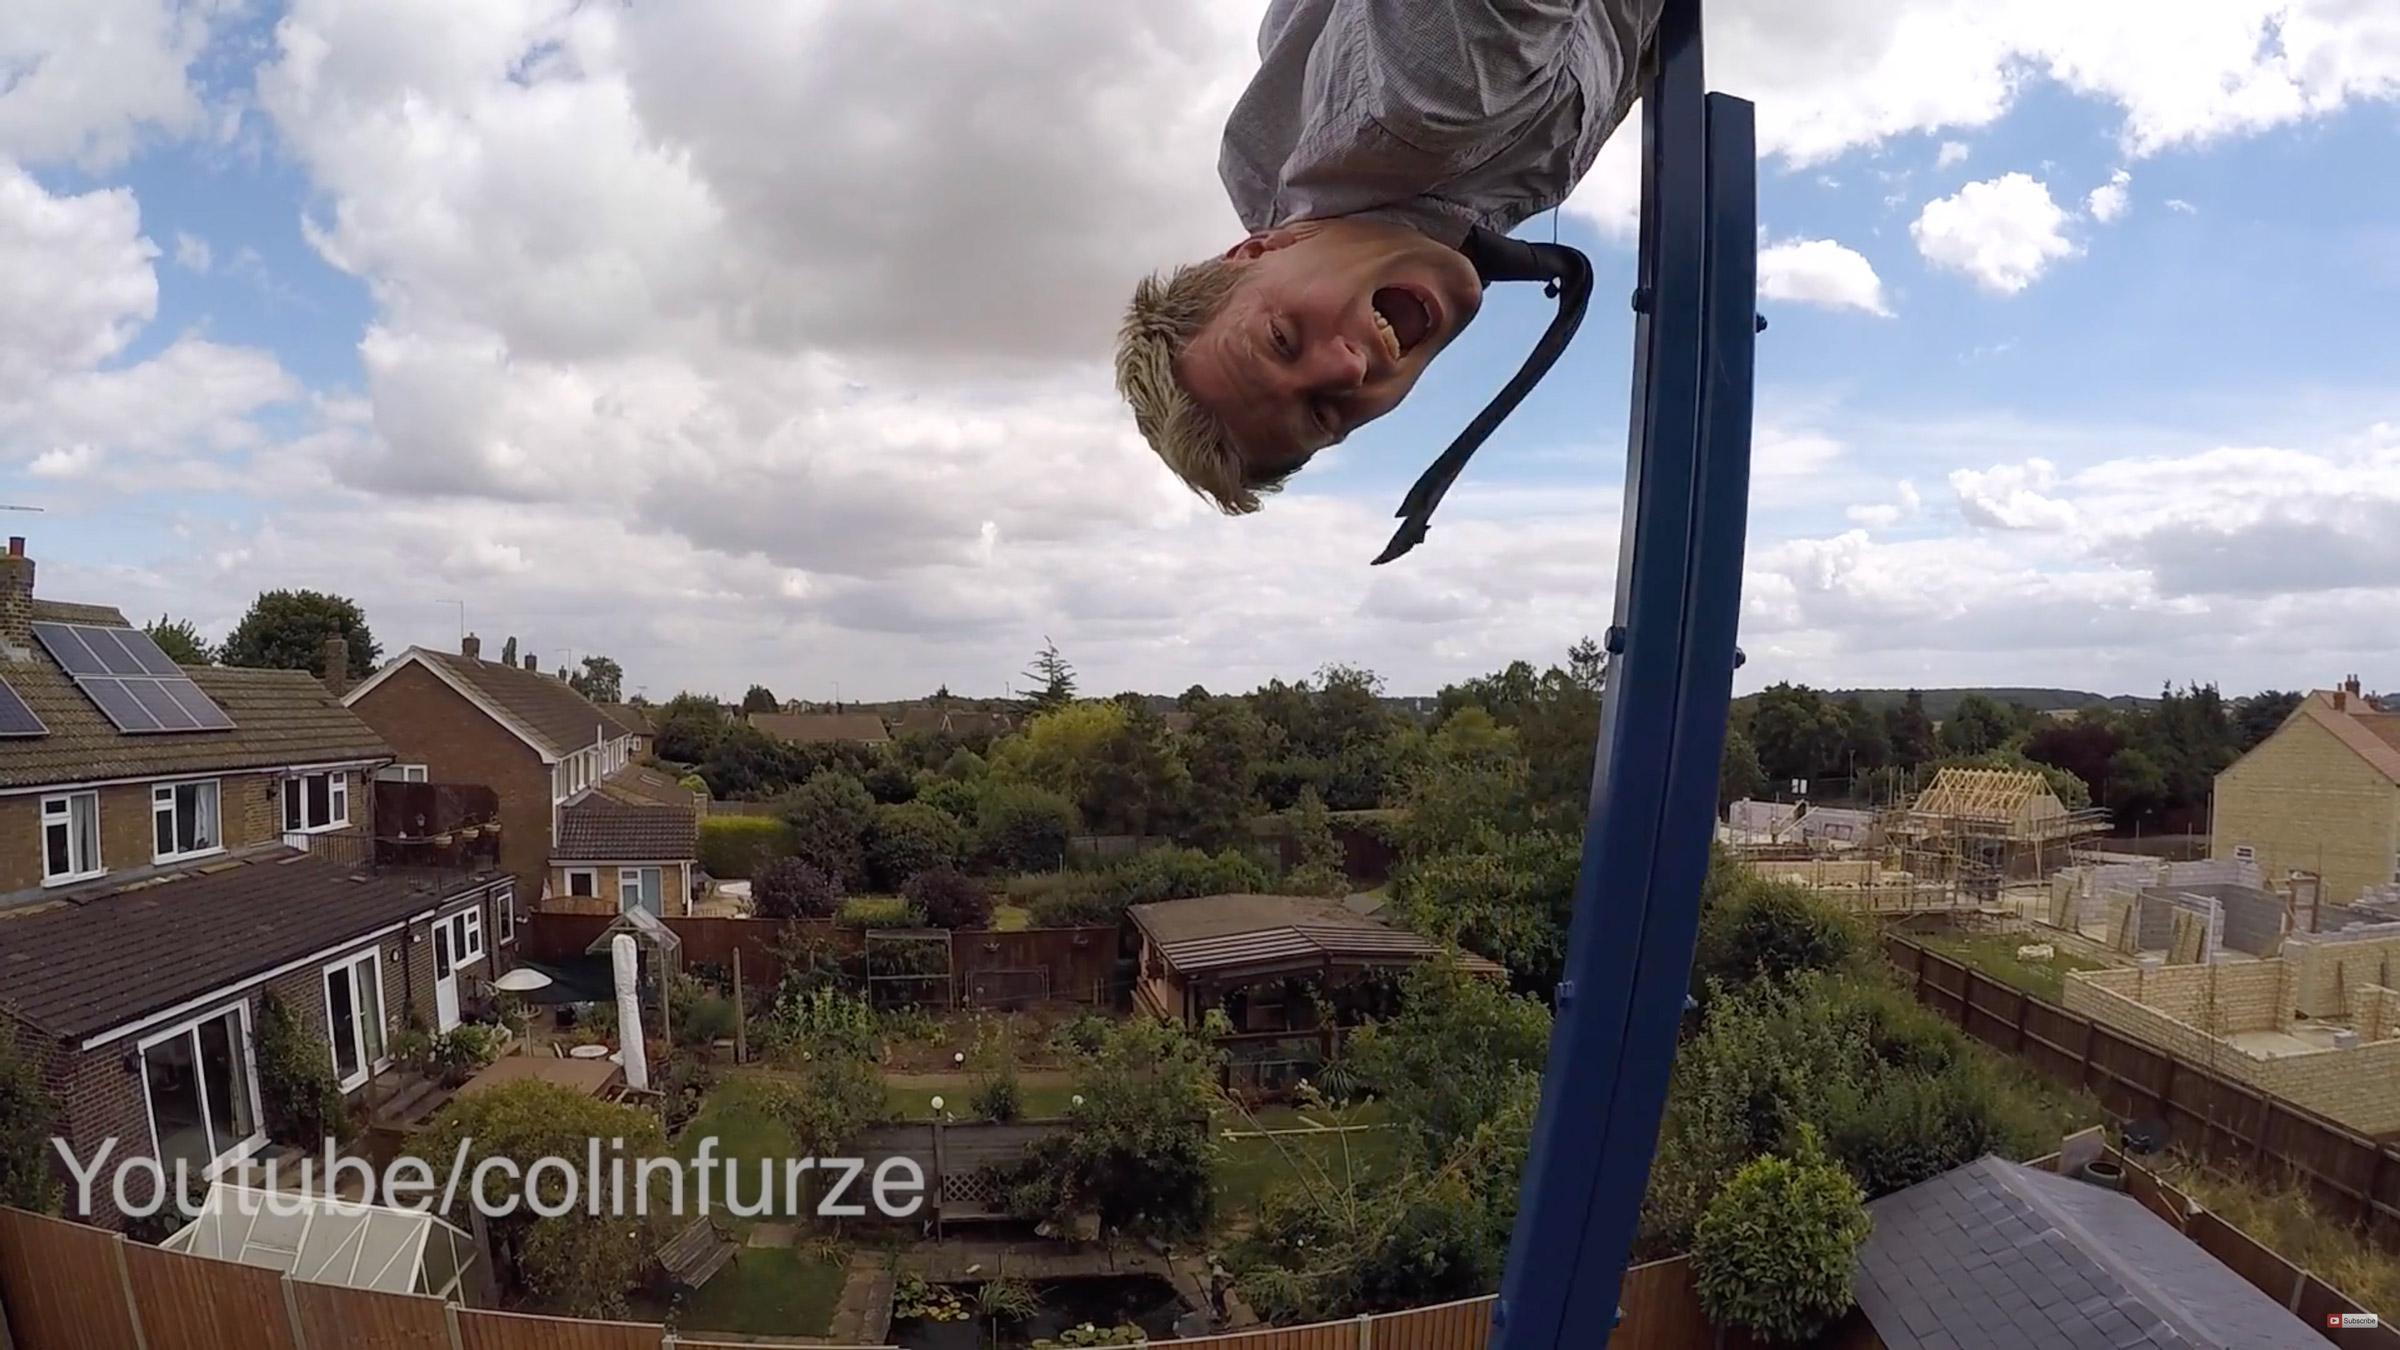 A Backyard 360-Degree Swing (Video)